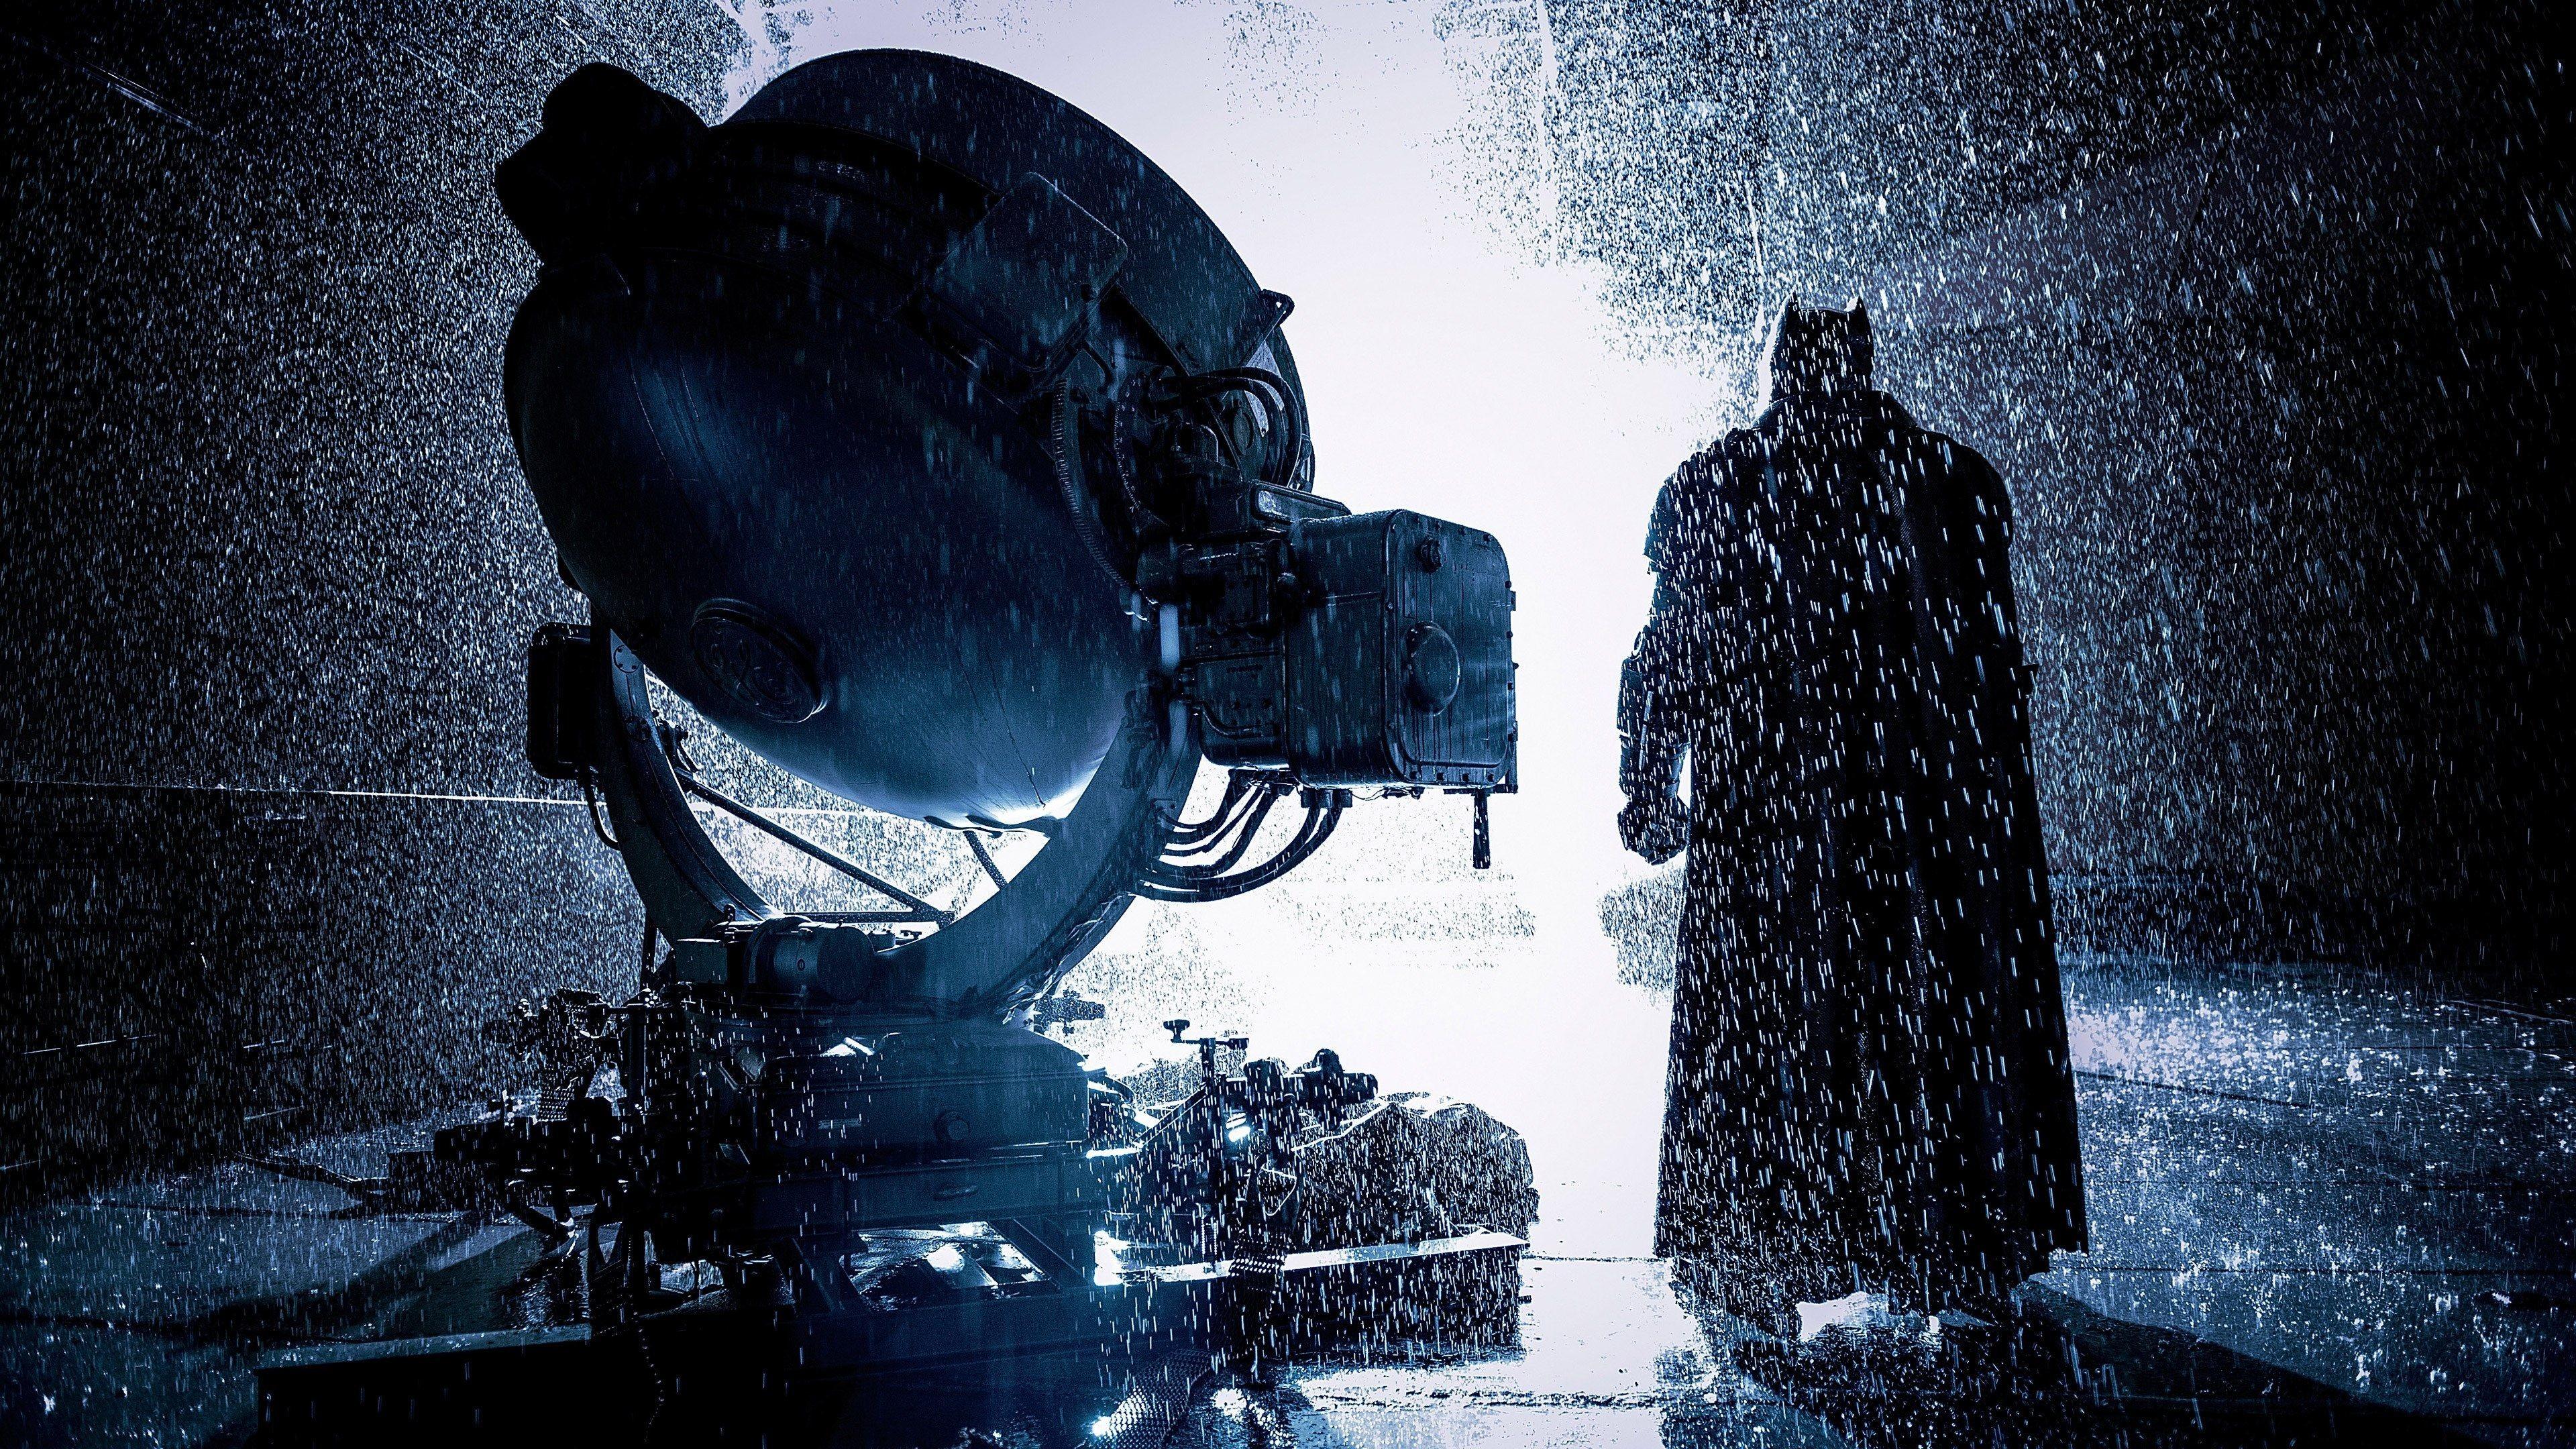 3840x2160, Batman Vs Superman 4k Download Free Wallpaper - Batman V Superman 4k Background - HD Wallpaper